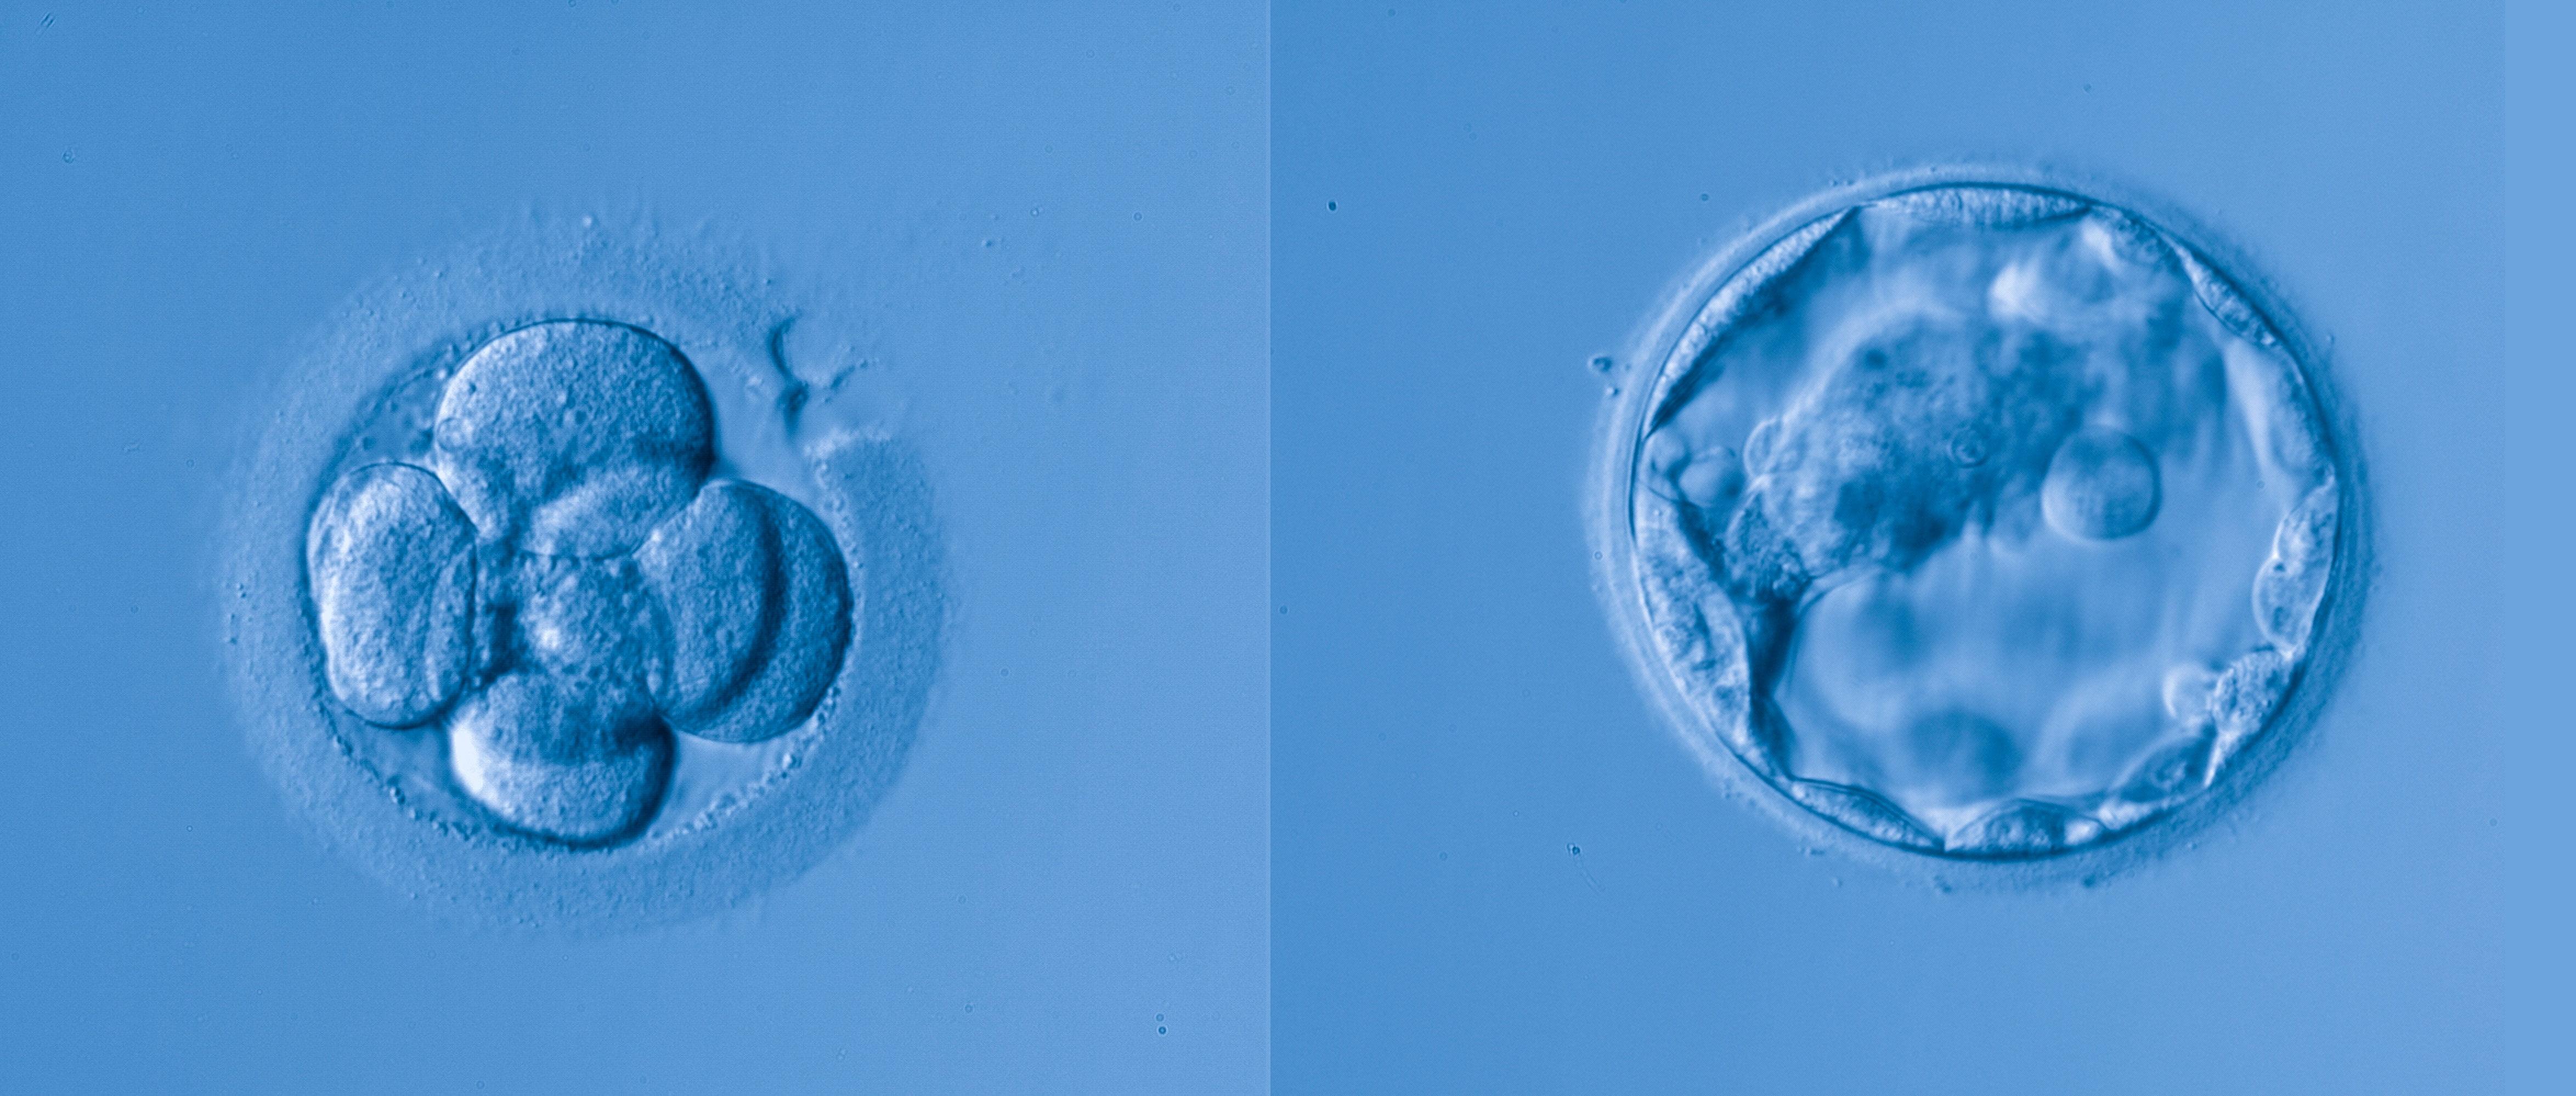 Transfert embryonnaire